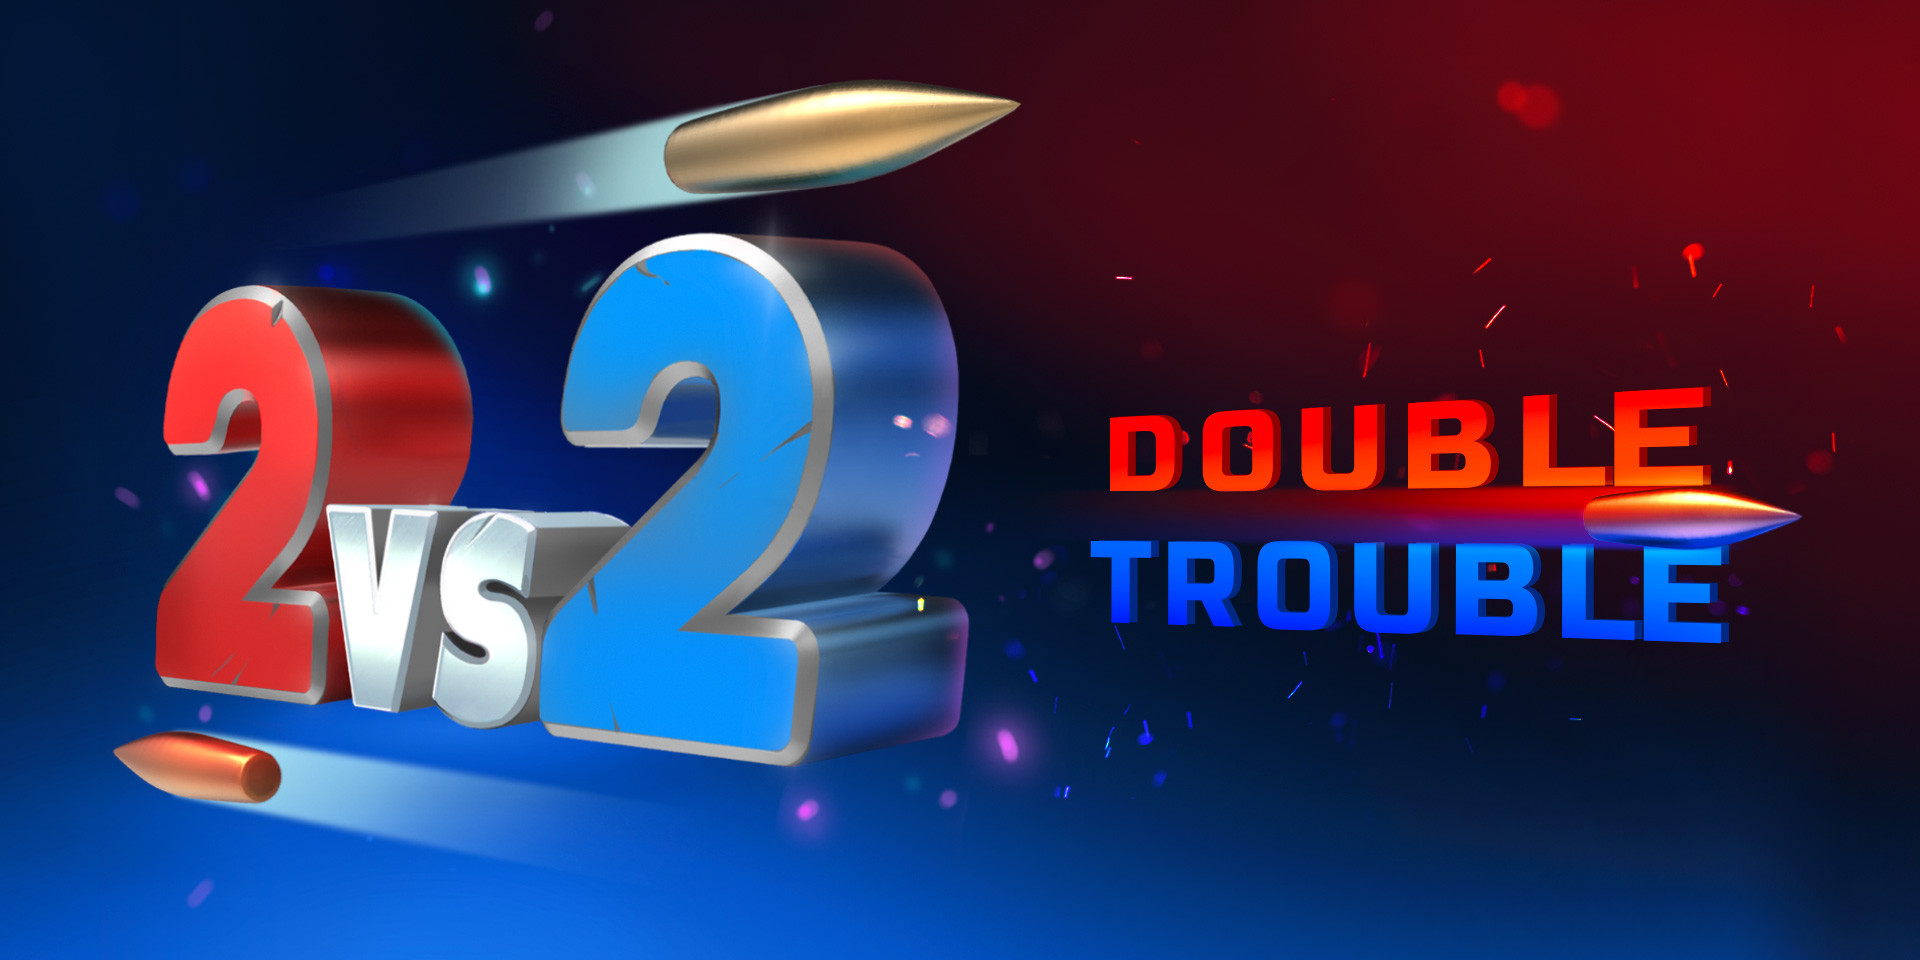 new-brawl-double-trouble-vM8qoVtLi8